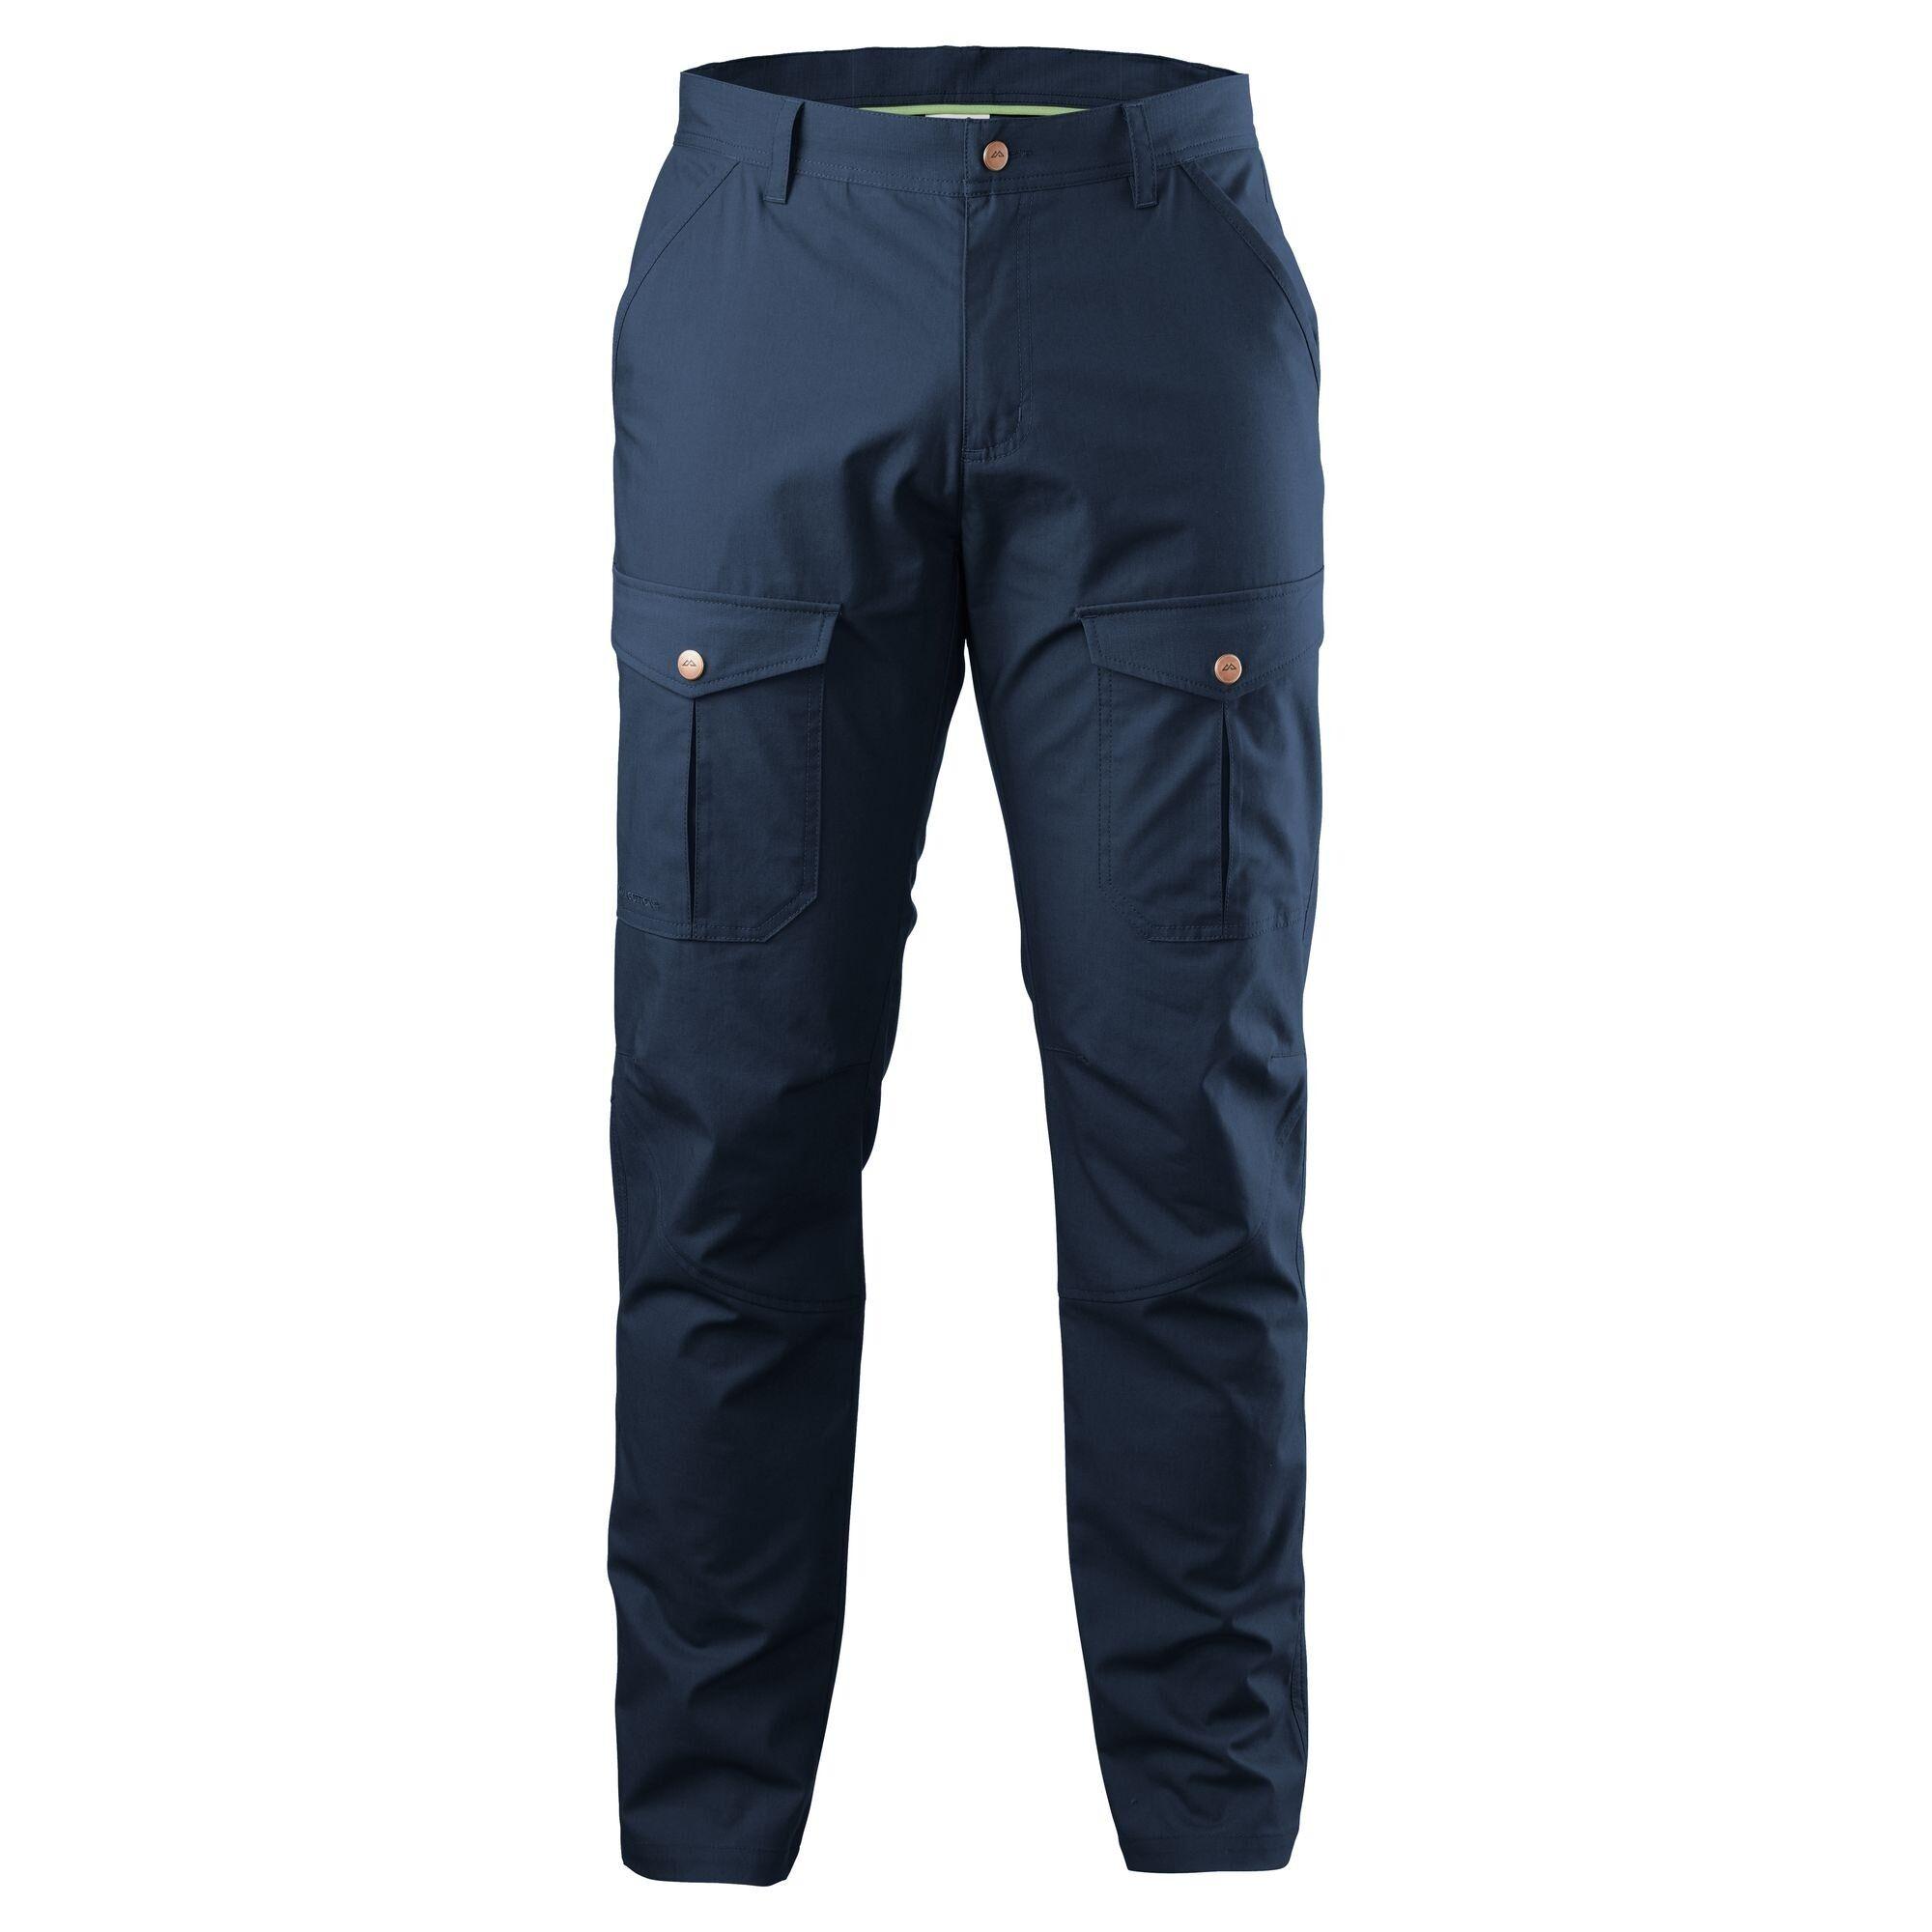 Kathmandu Nduro Men's Trousers  - Midnight Navy - Size: Extra Large